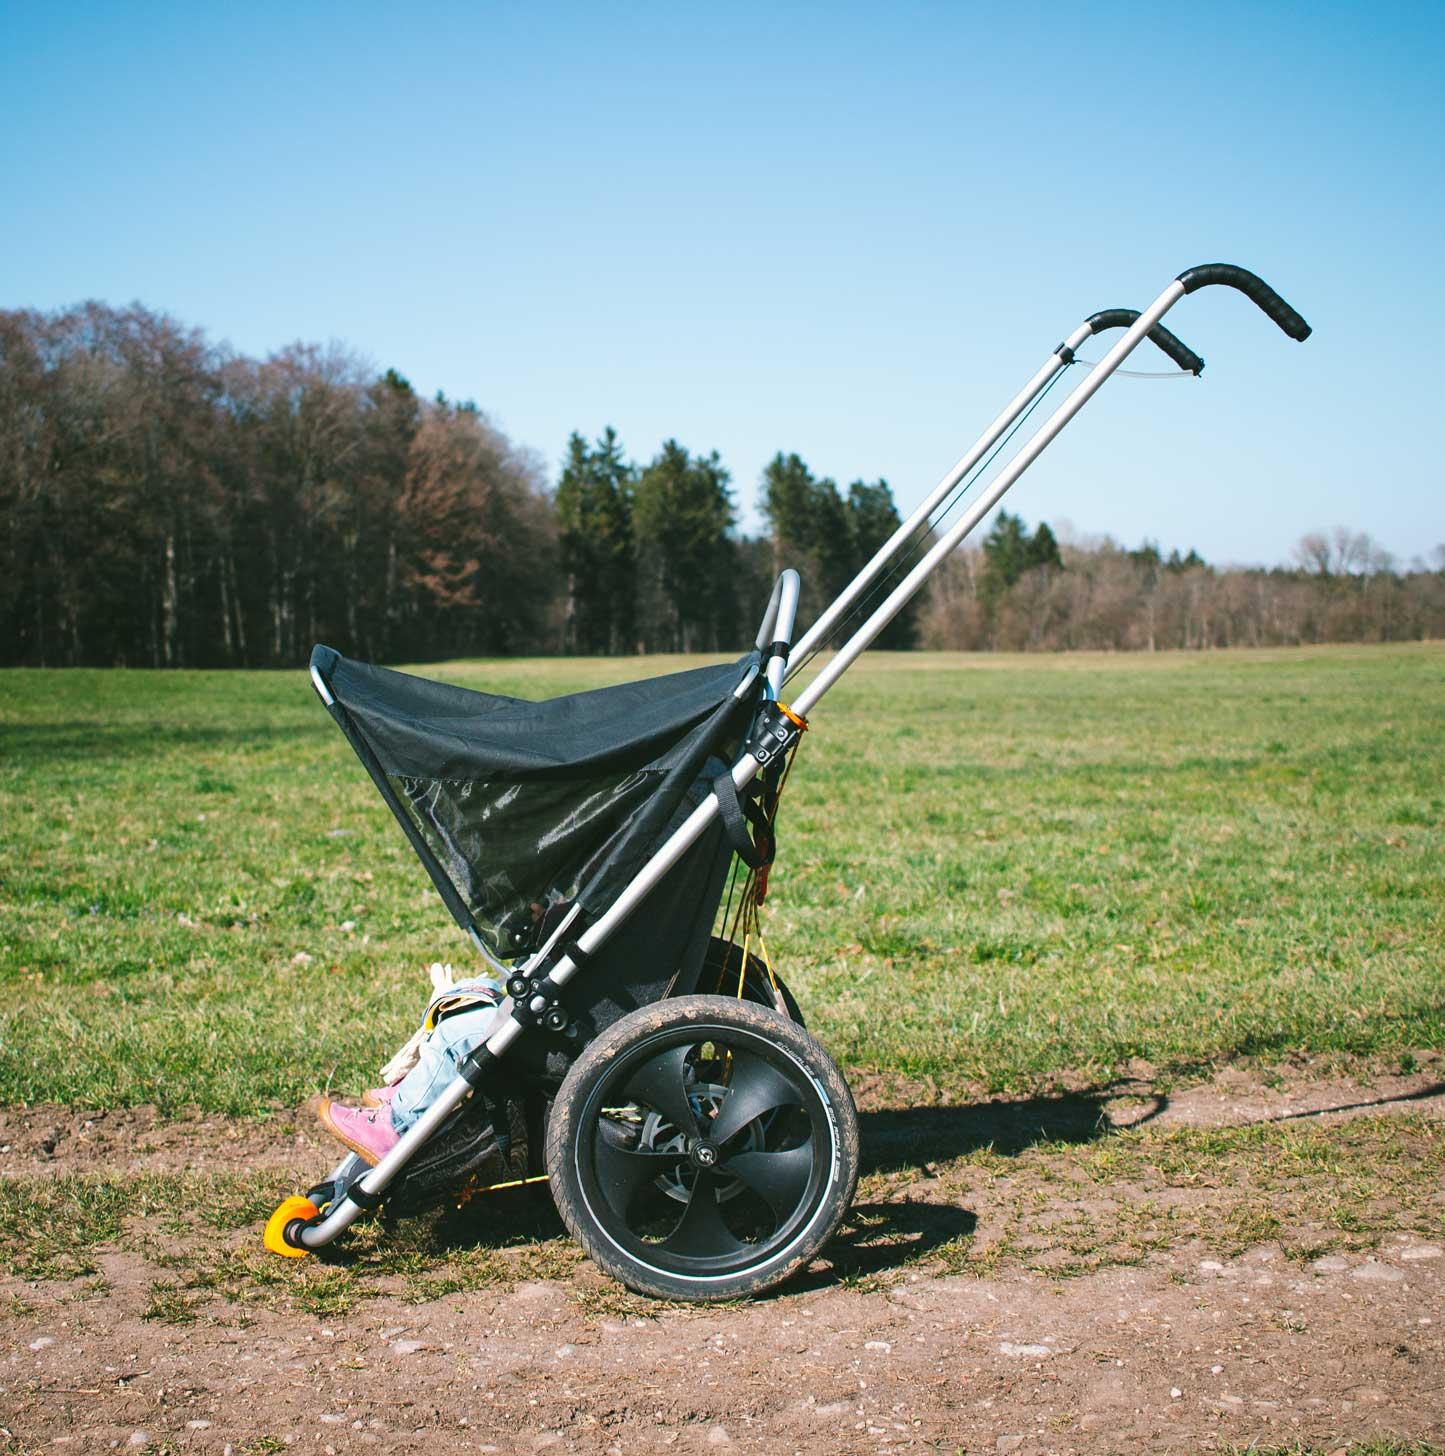 Hike-Kid-Wiese-kinderwagen-outdoor